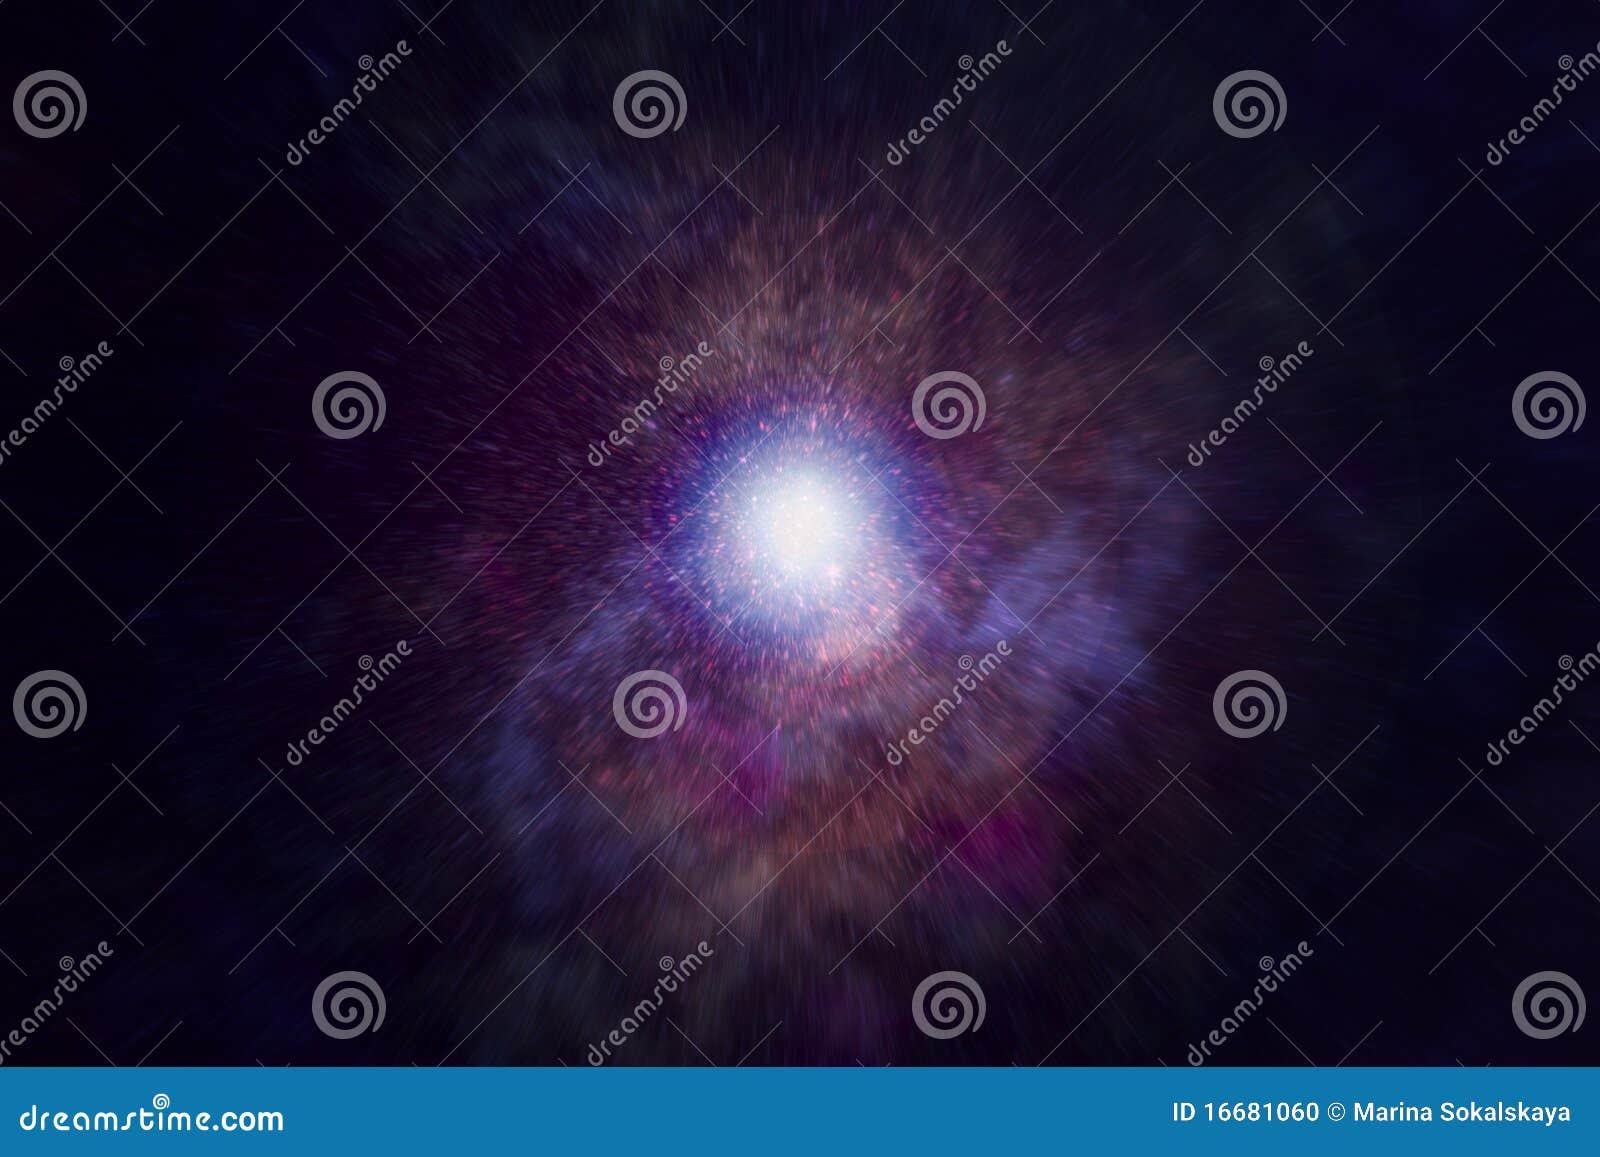 supernova landscape - photo #42